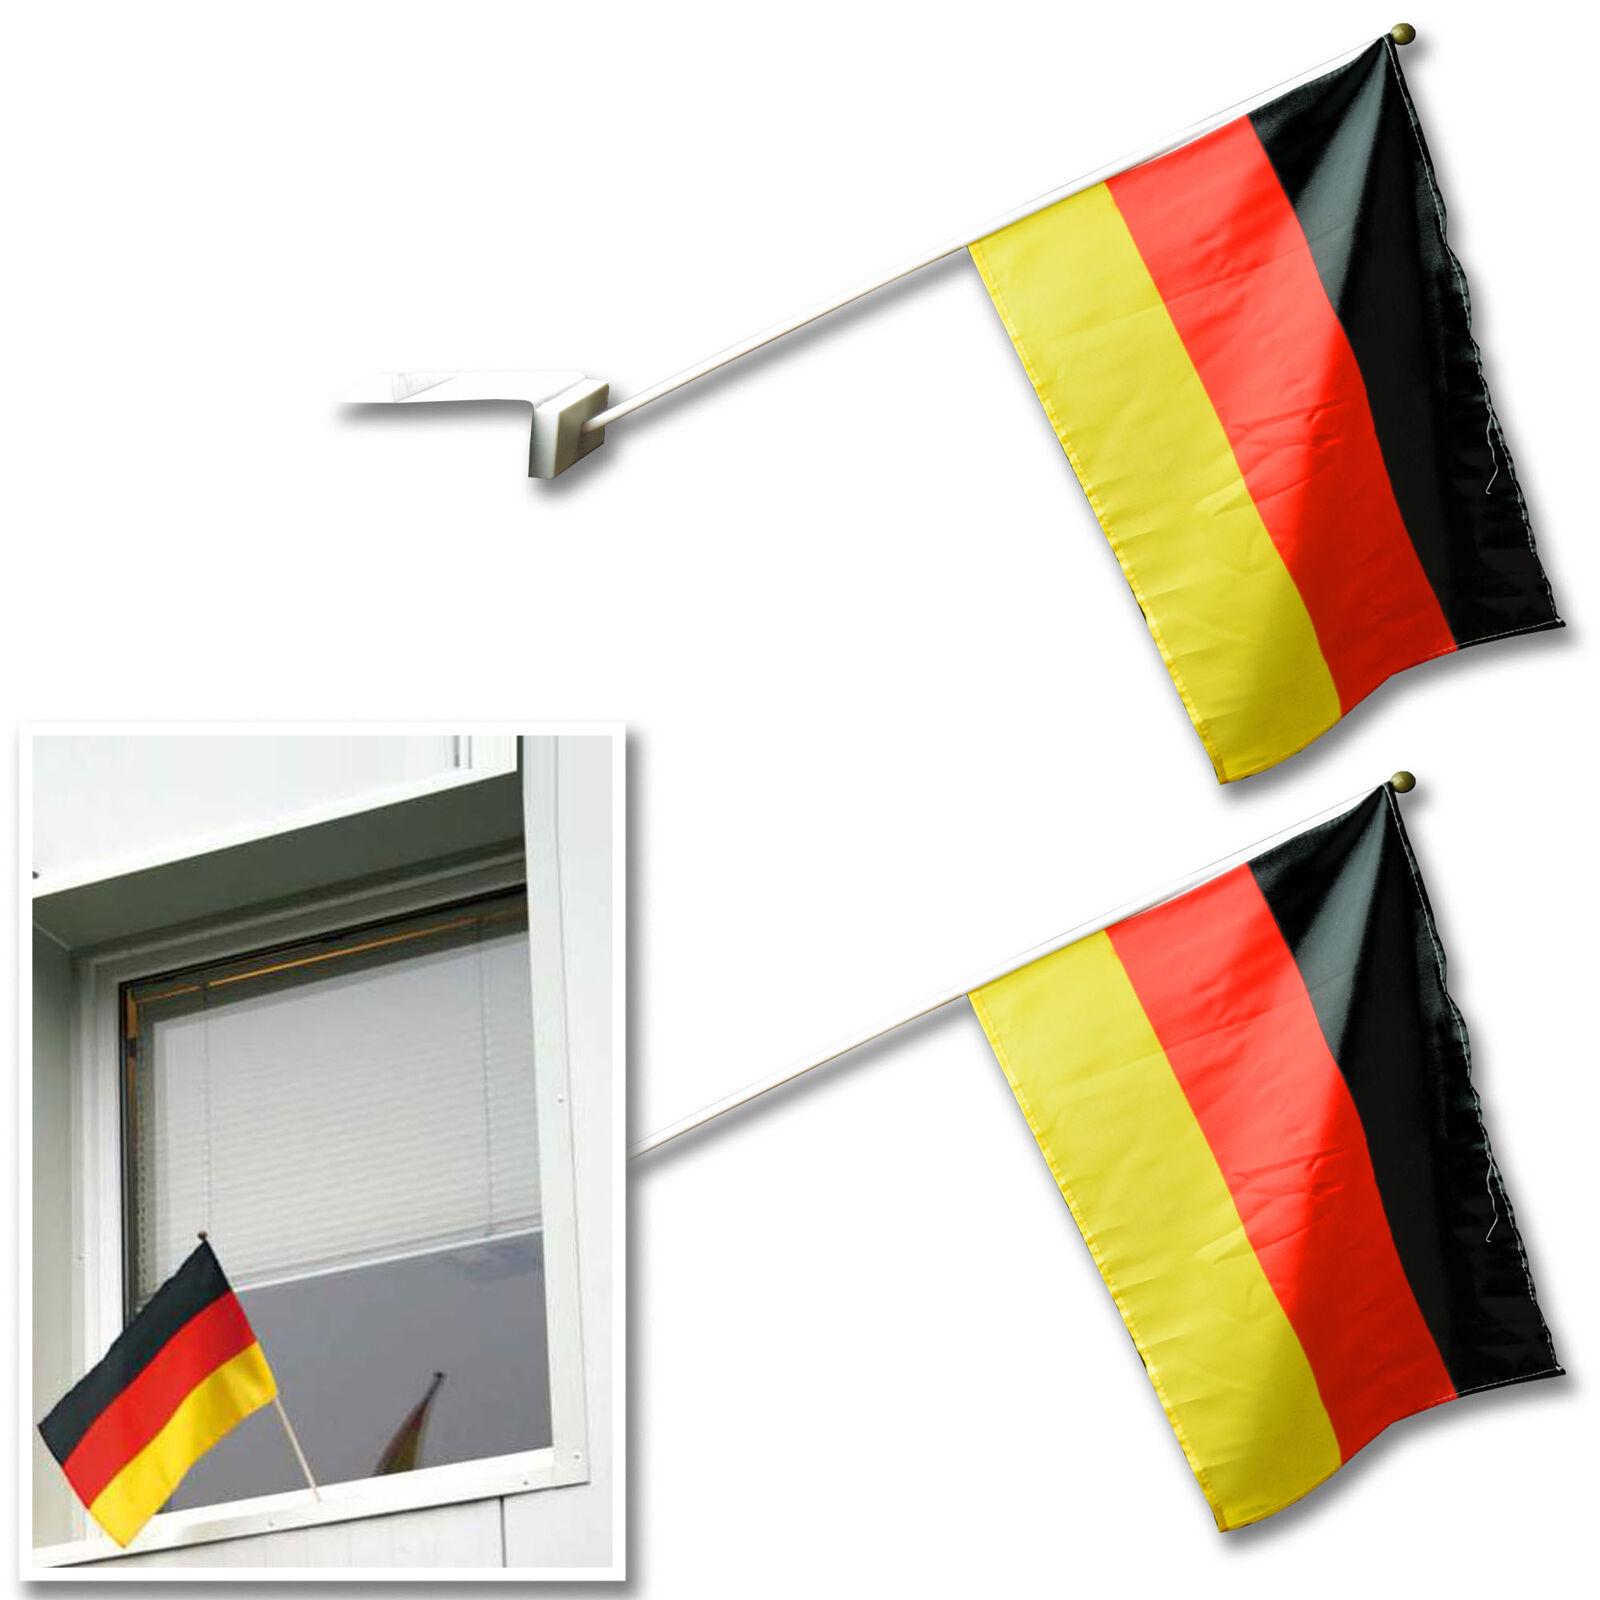 30x Deutschland-Fahne Deutschlandfahne Deutsche Flagge Flag am Stab 45 x 30 cm